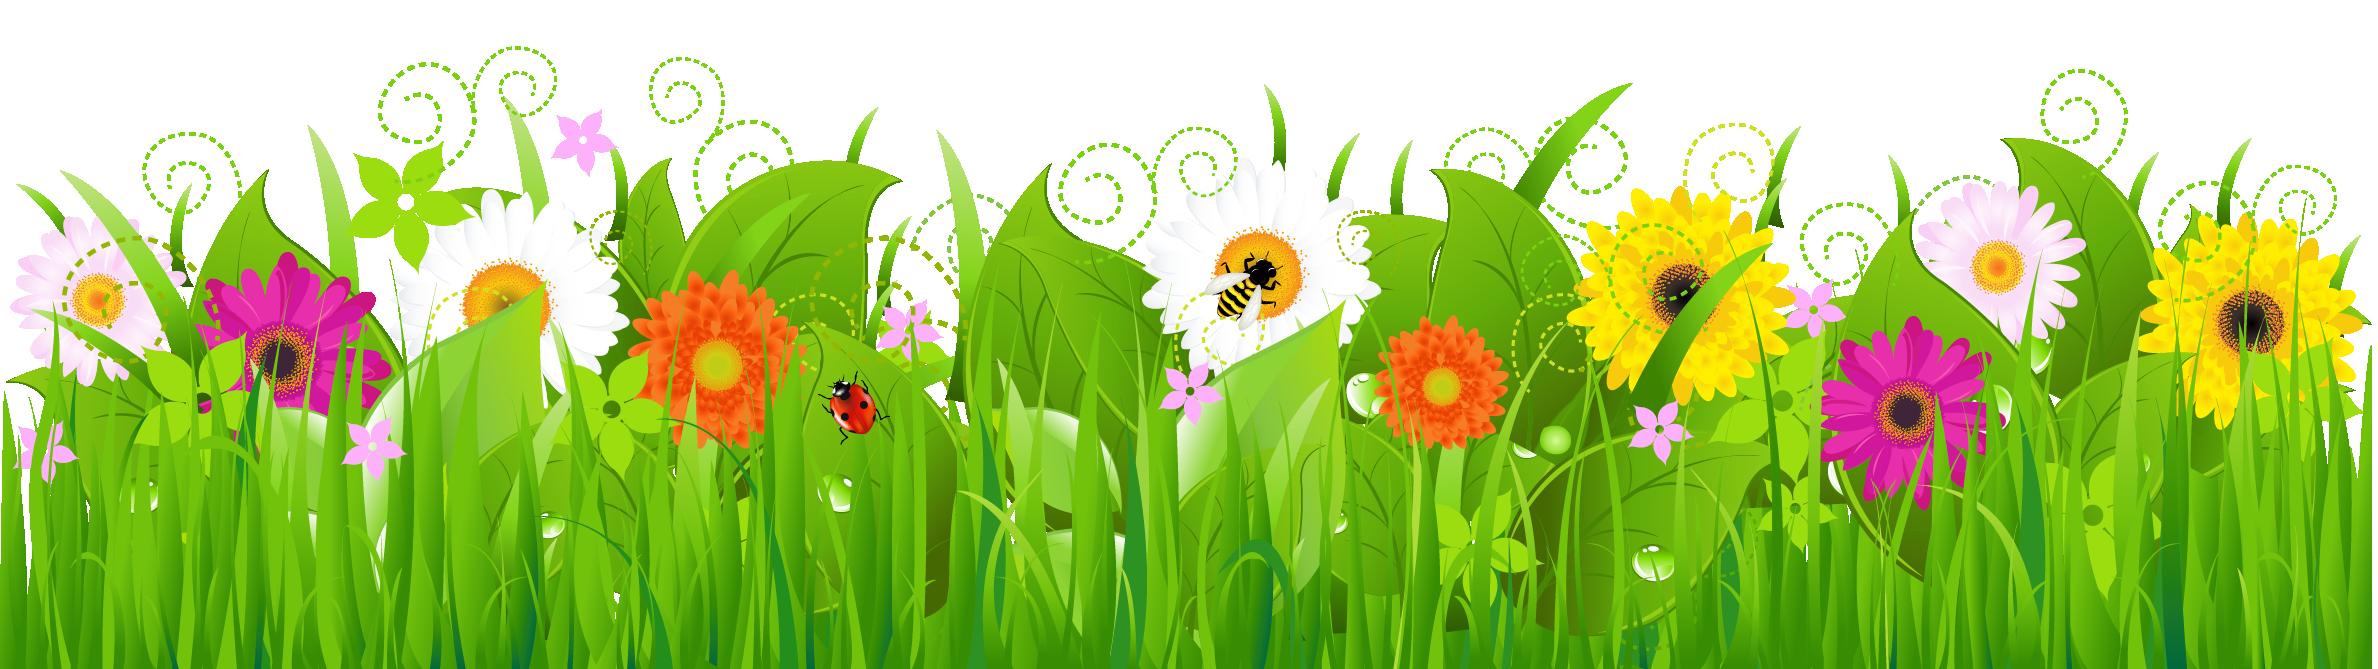 clipart grass ground